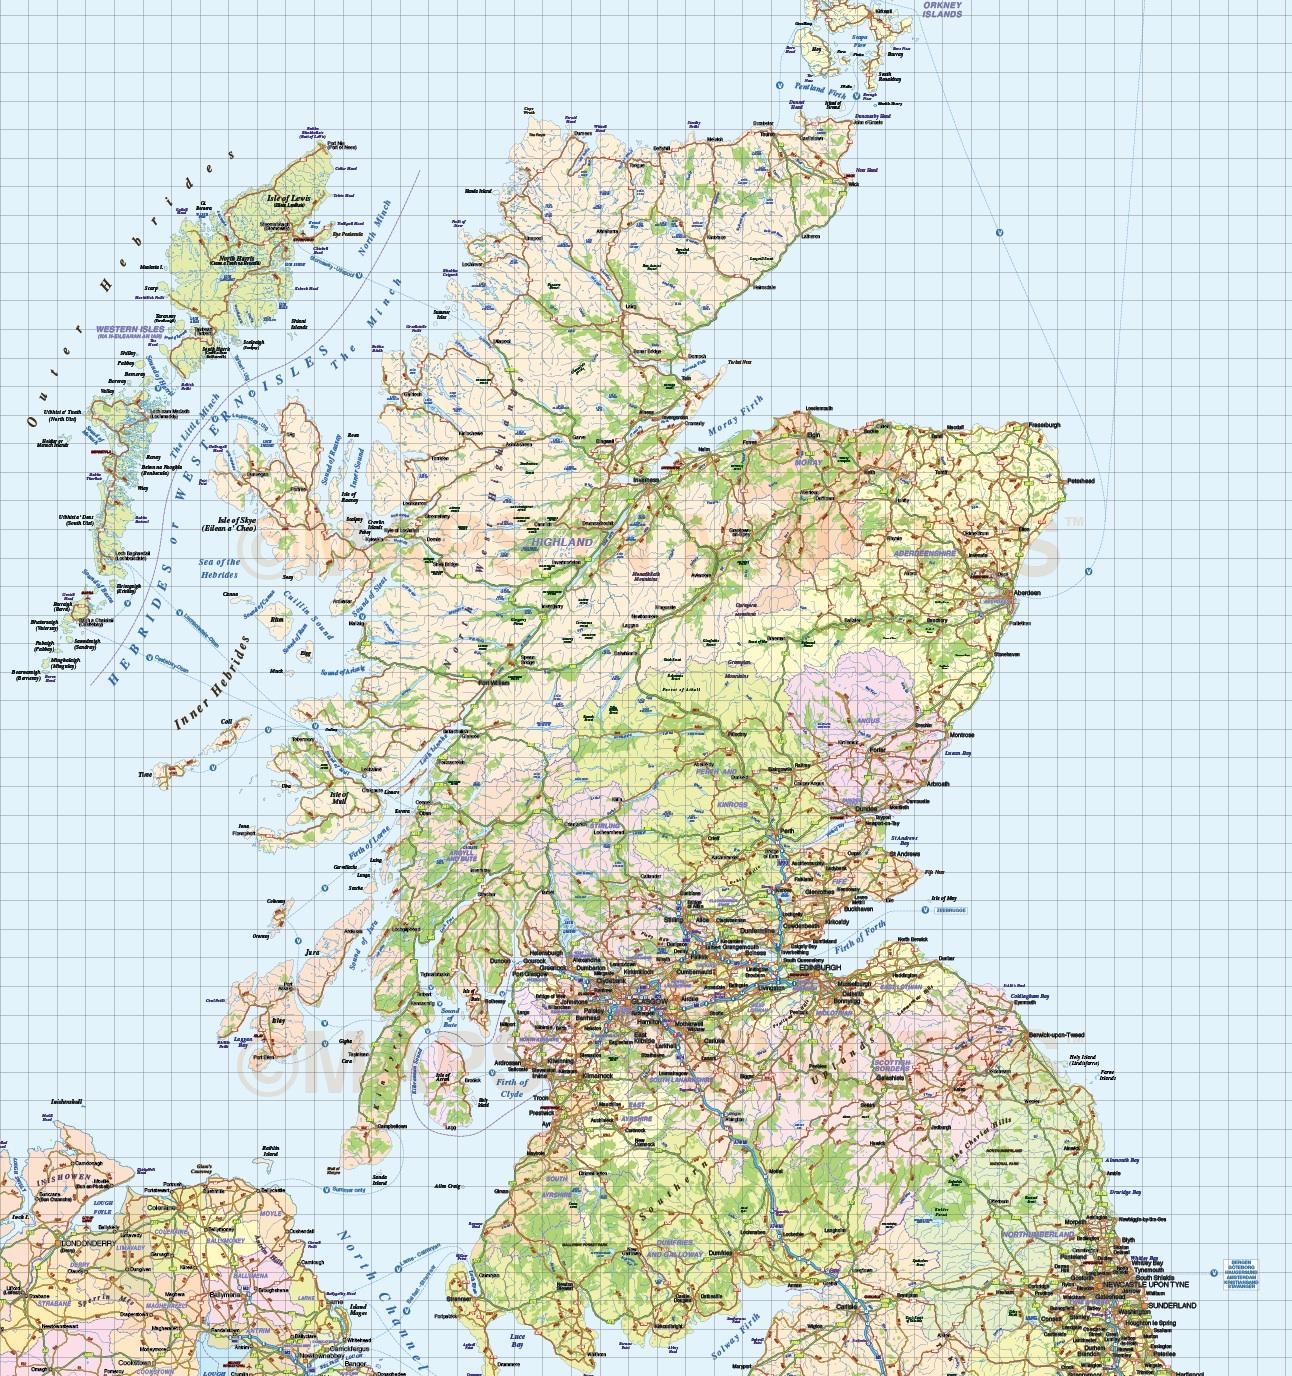 Detailed Road Map Of England.Detailed British Isles Uk Road And Rail Map Illustrator Ai Cs